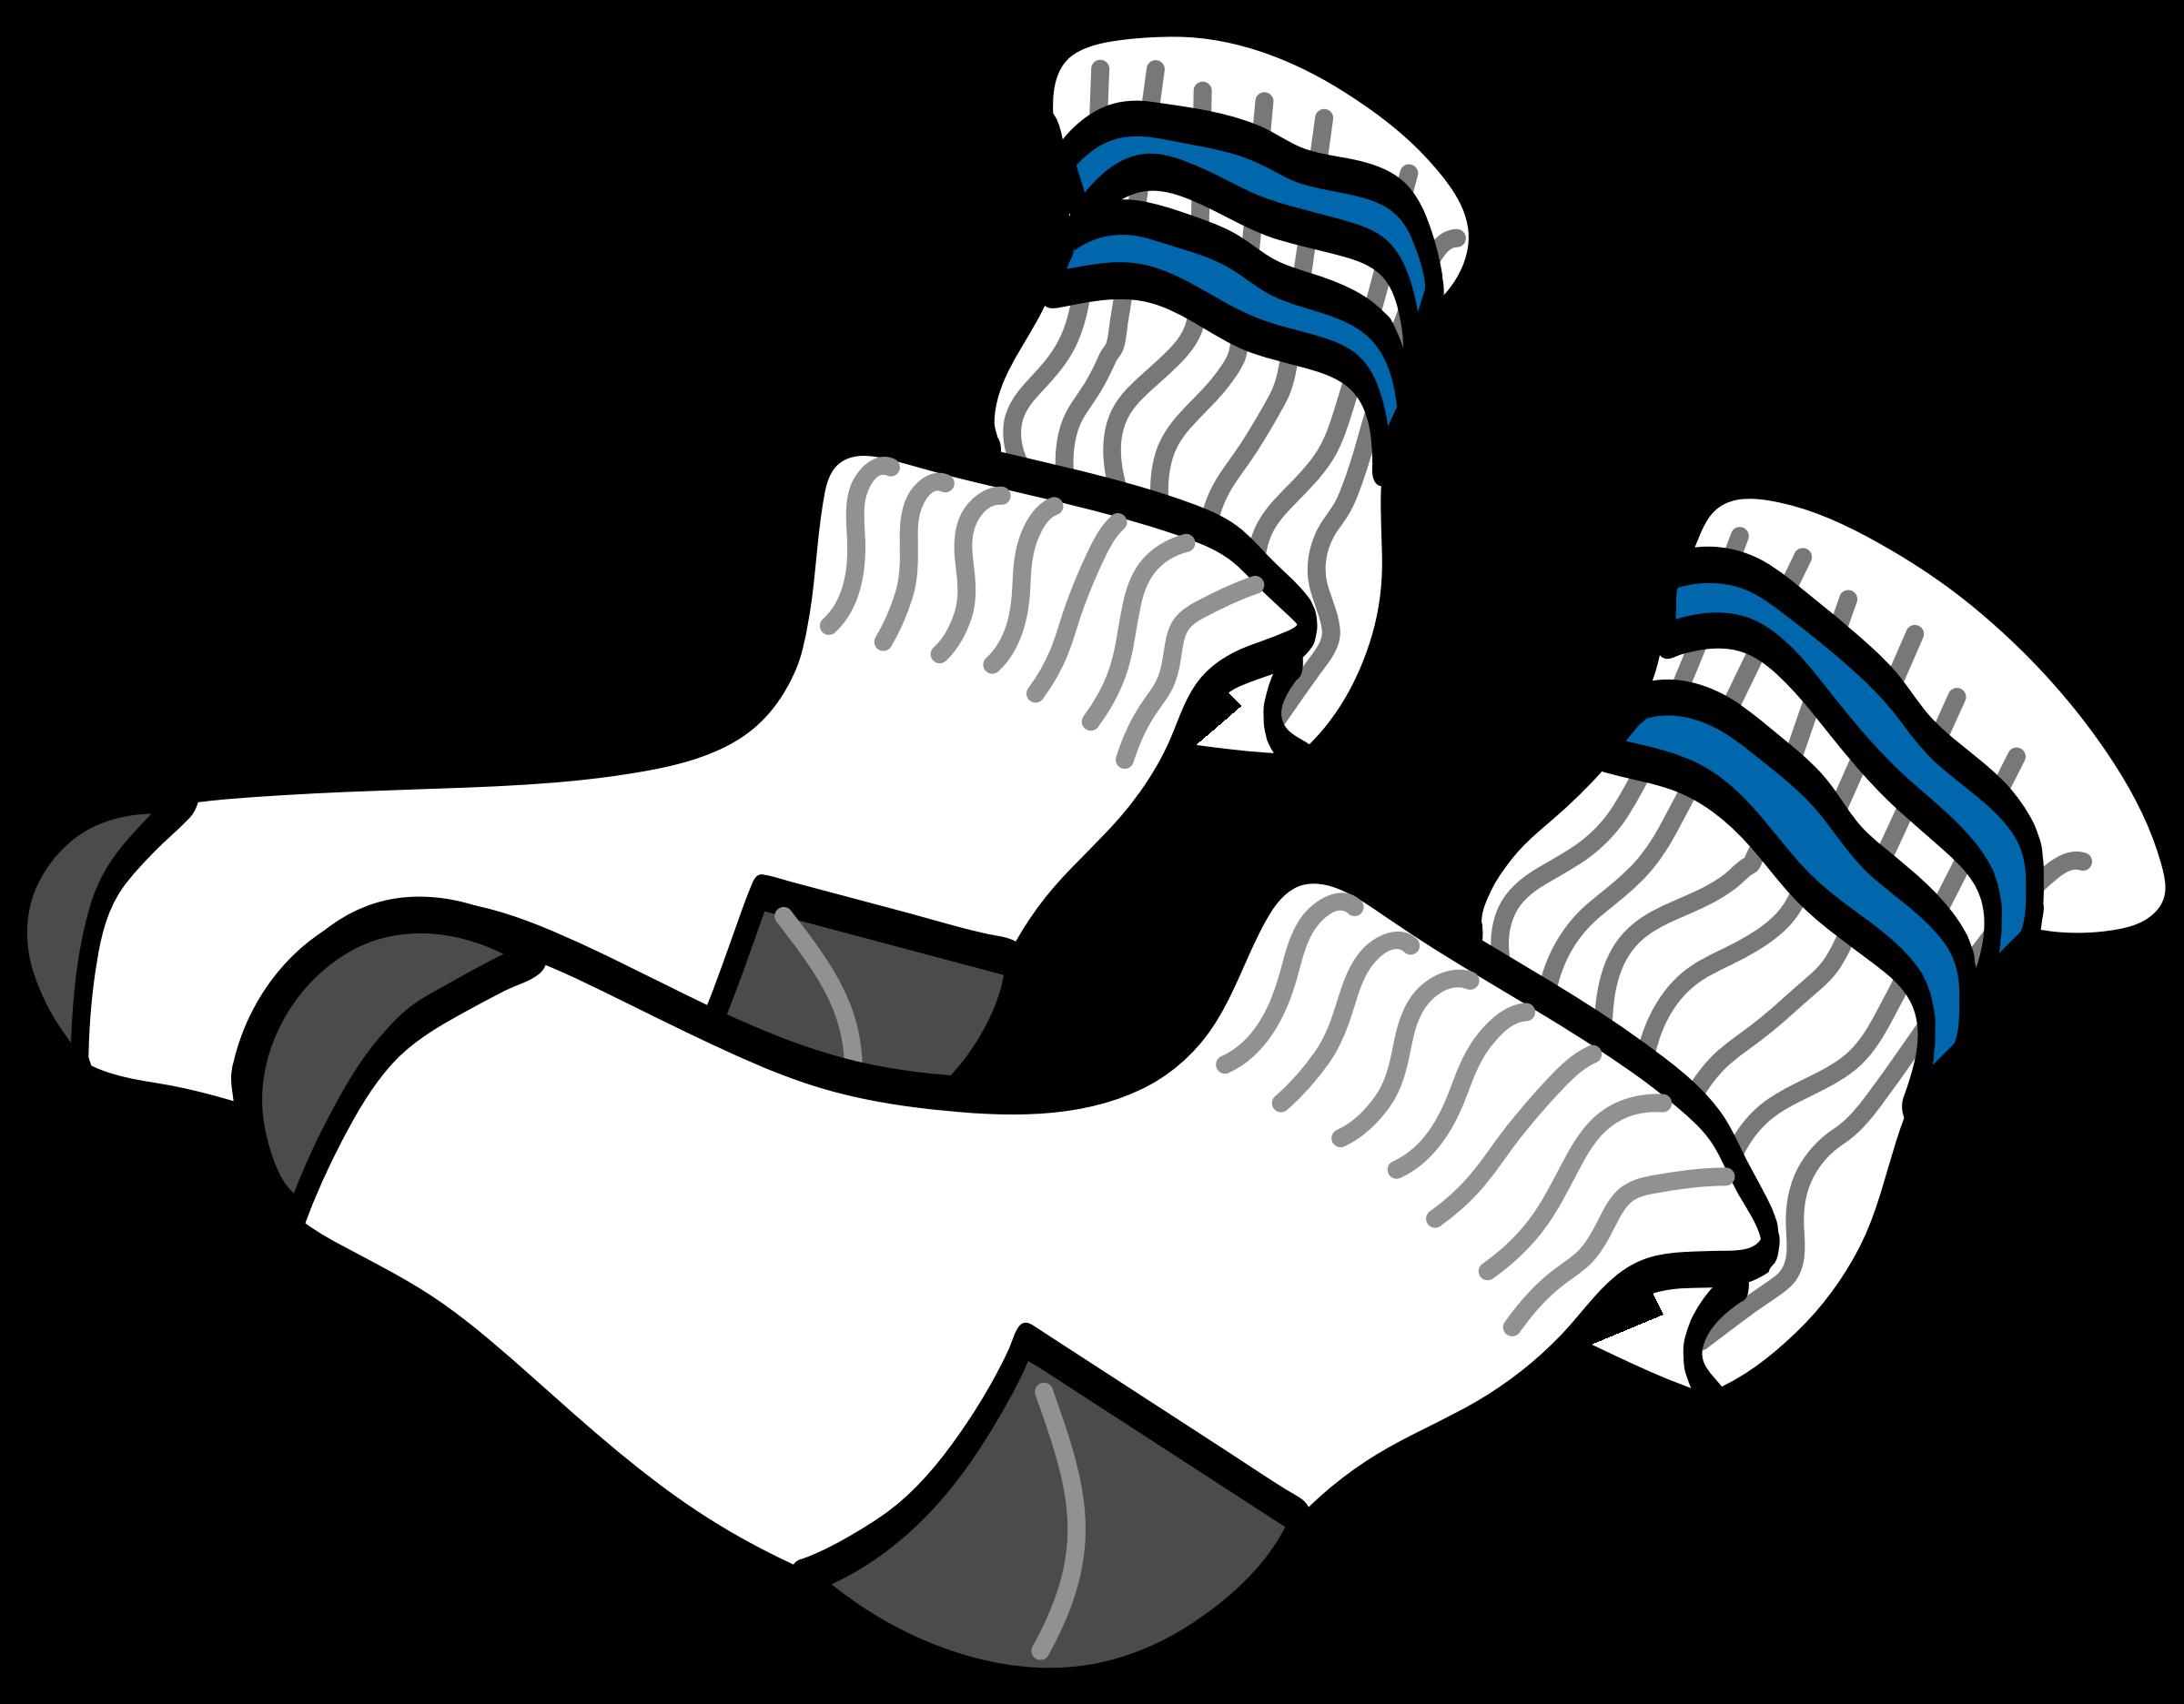 1834 Socks free clipart.